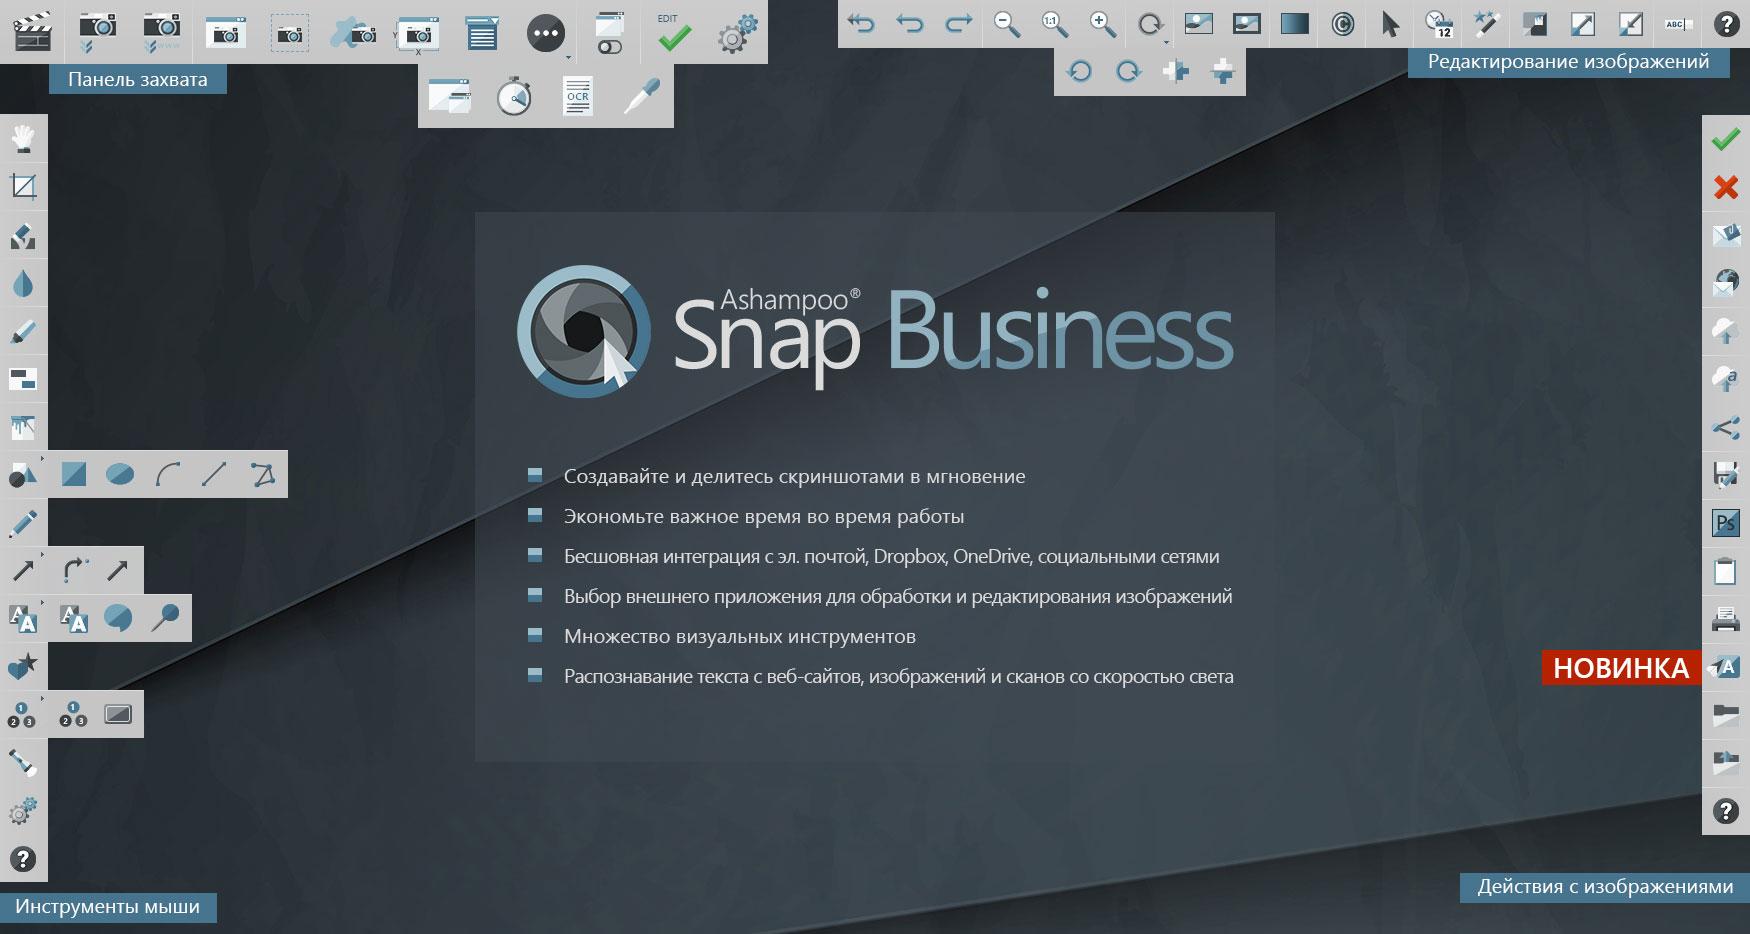 https://img.ashampoo.com/ashampoo.com_images/img/1/products/1624/ru/screenshots/scr_ashampoo_snap_business_overview_functions_ru.jpg